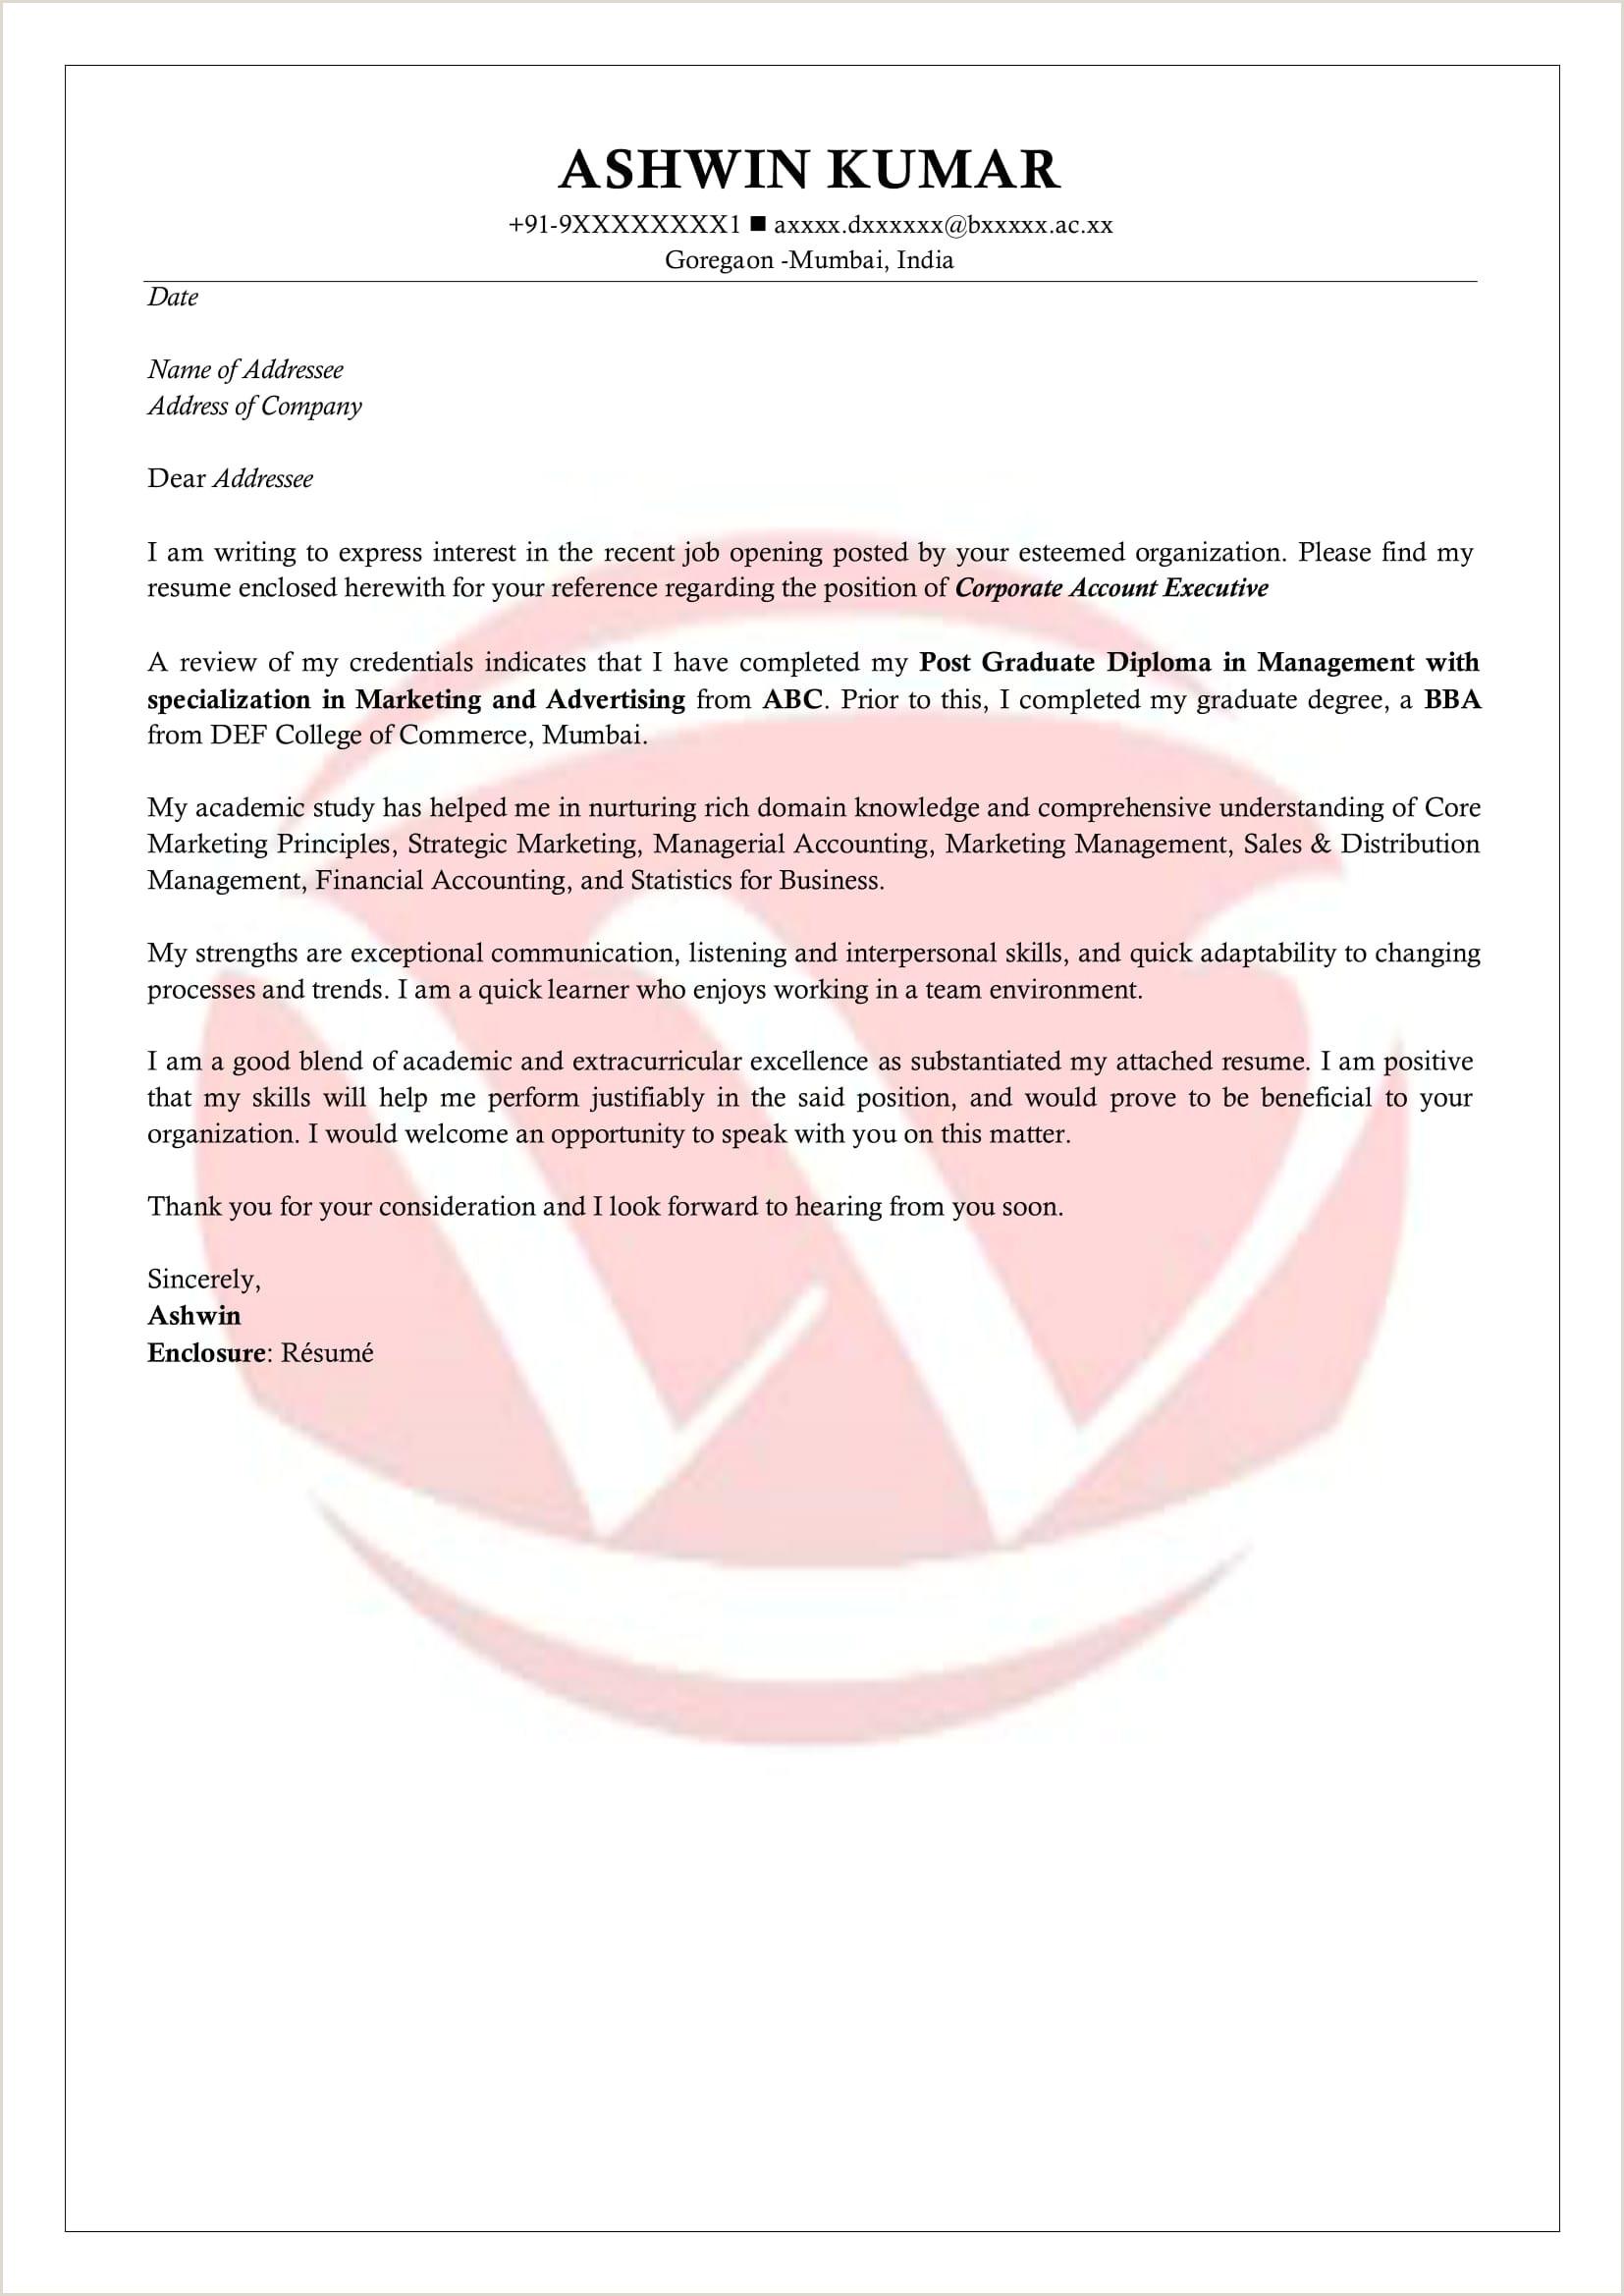 Fresher Resume format for Banking Freshers Sample Cover Letter format Download Cover Letter